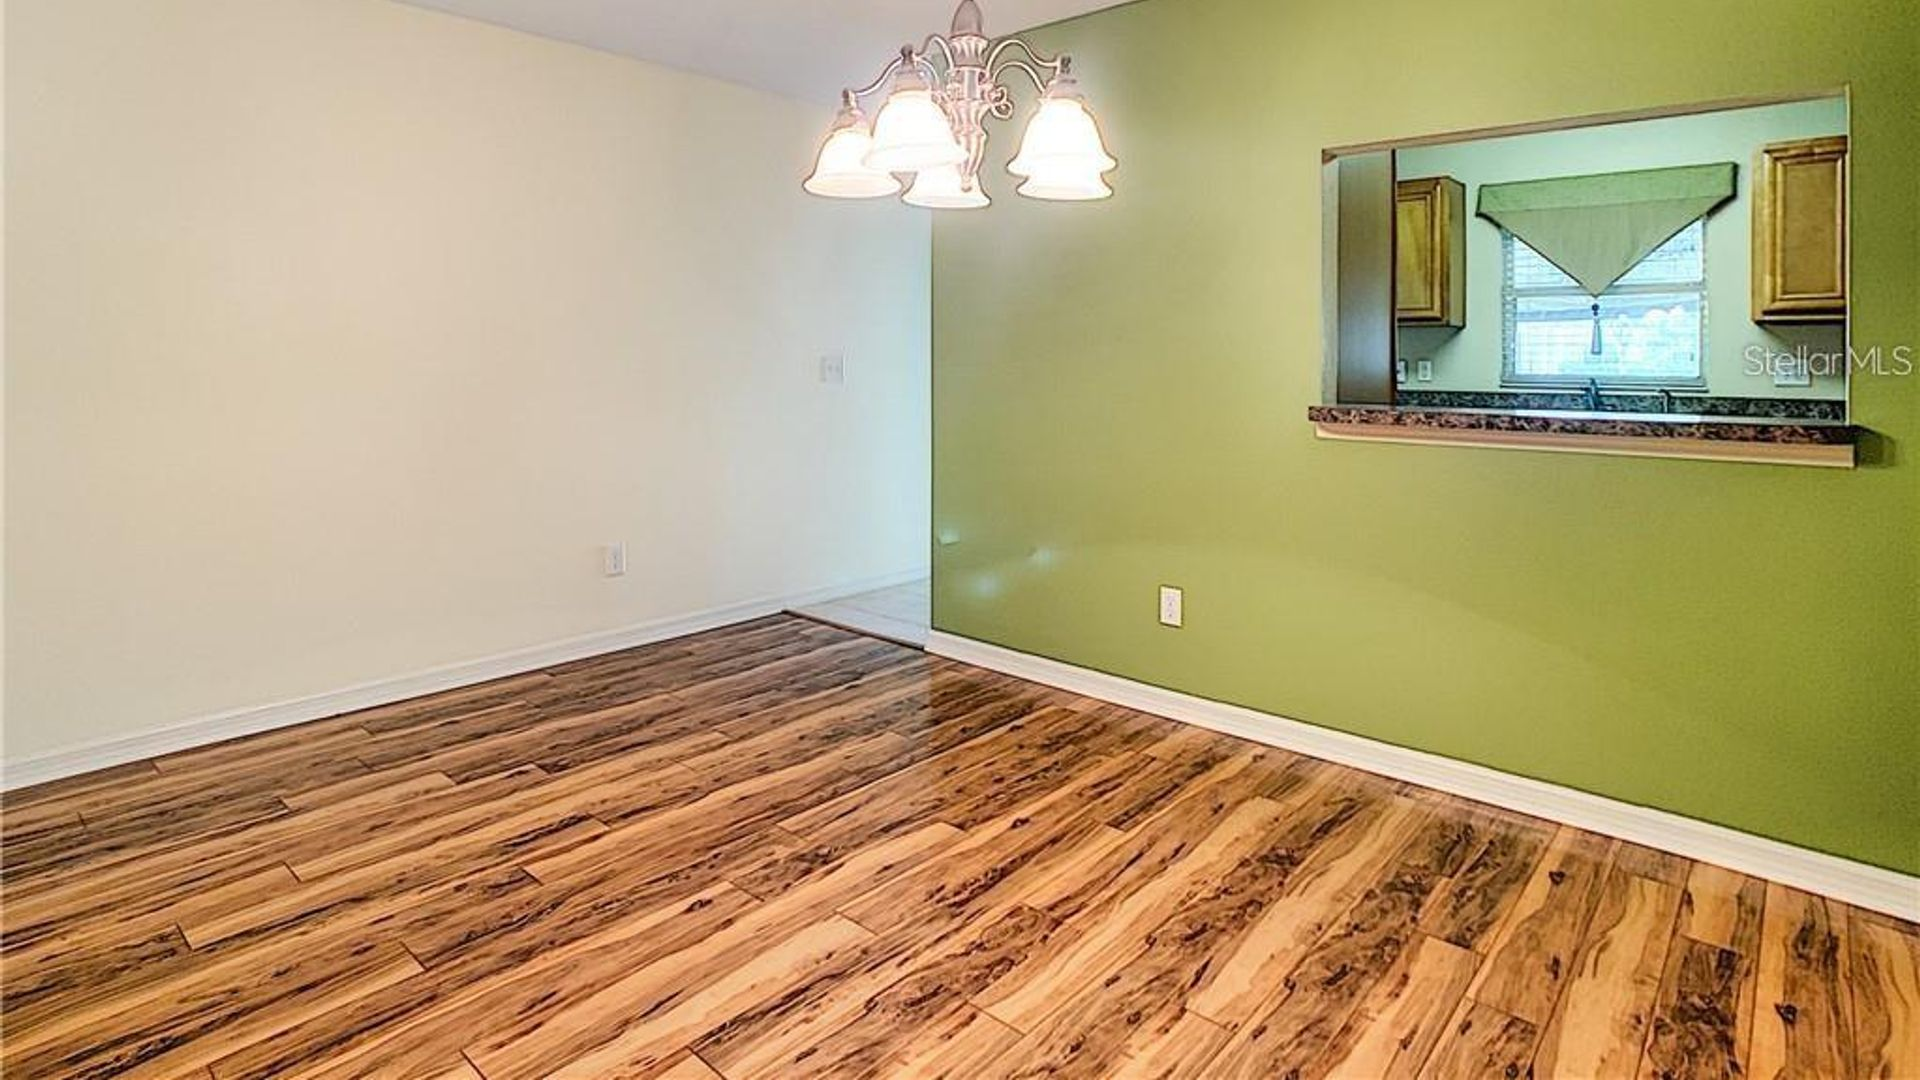 2 bed townhouse at 314 Belvedere Way, Sanford, FL 32773 ...